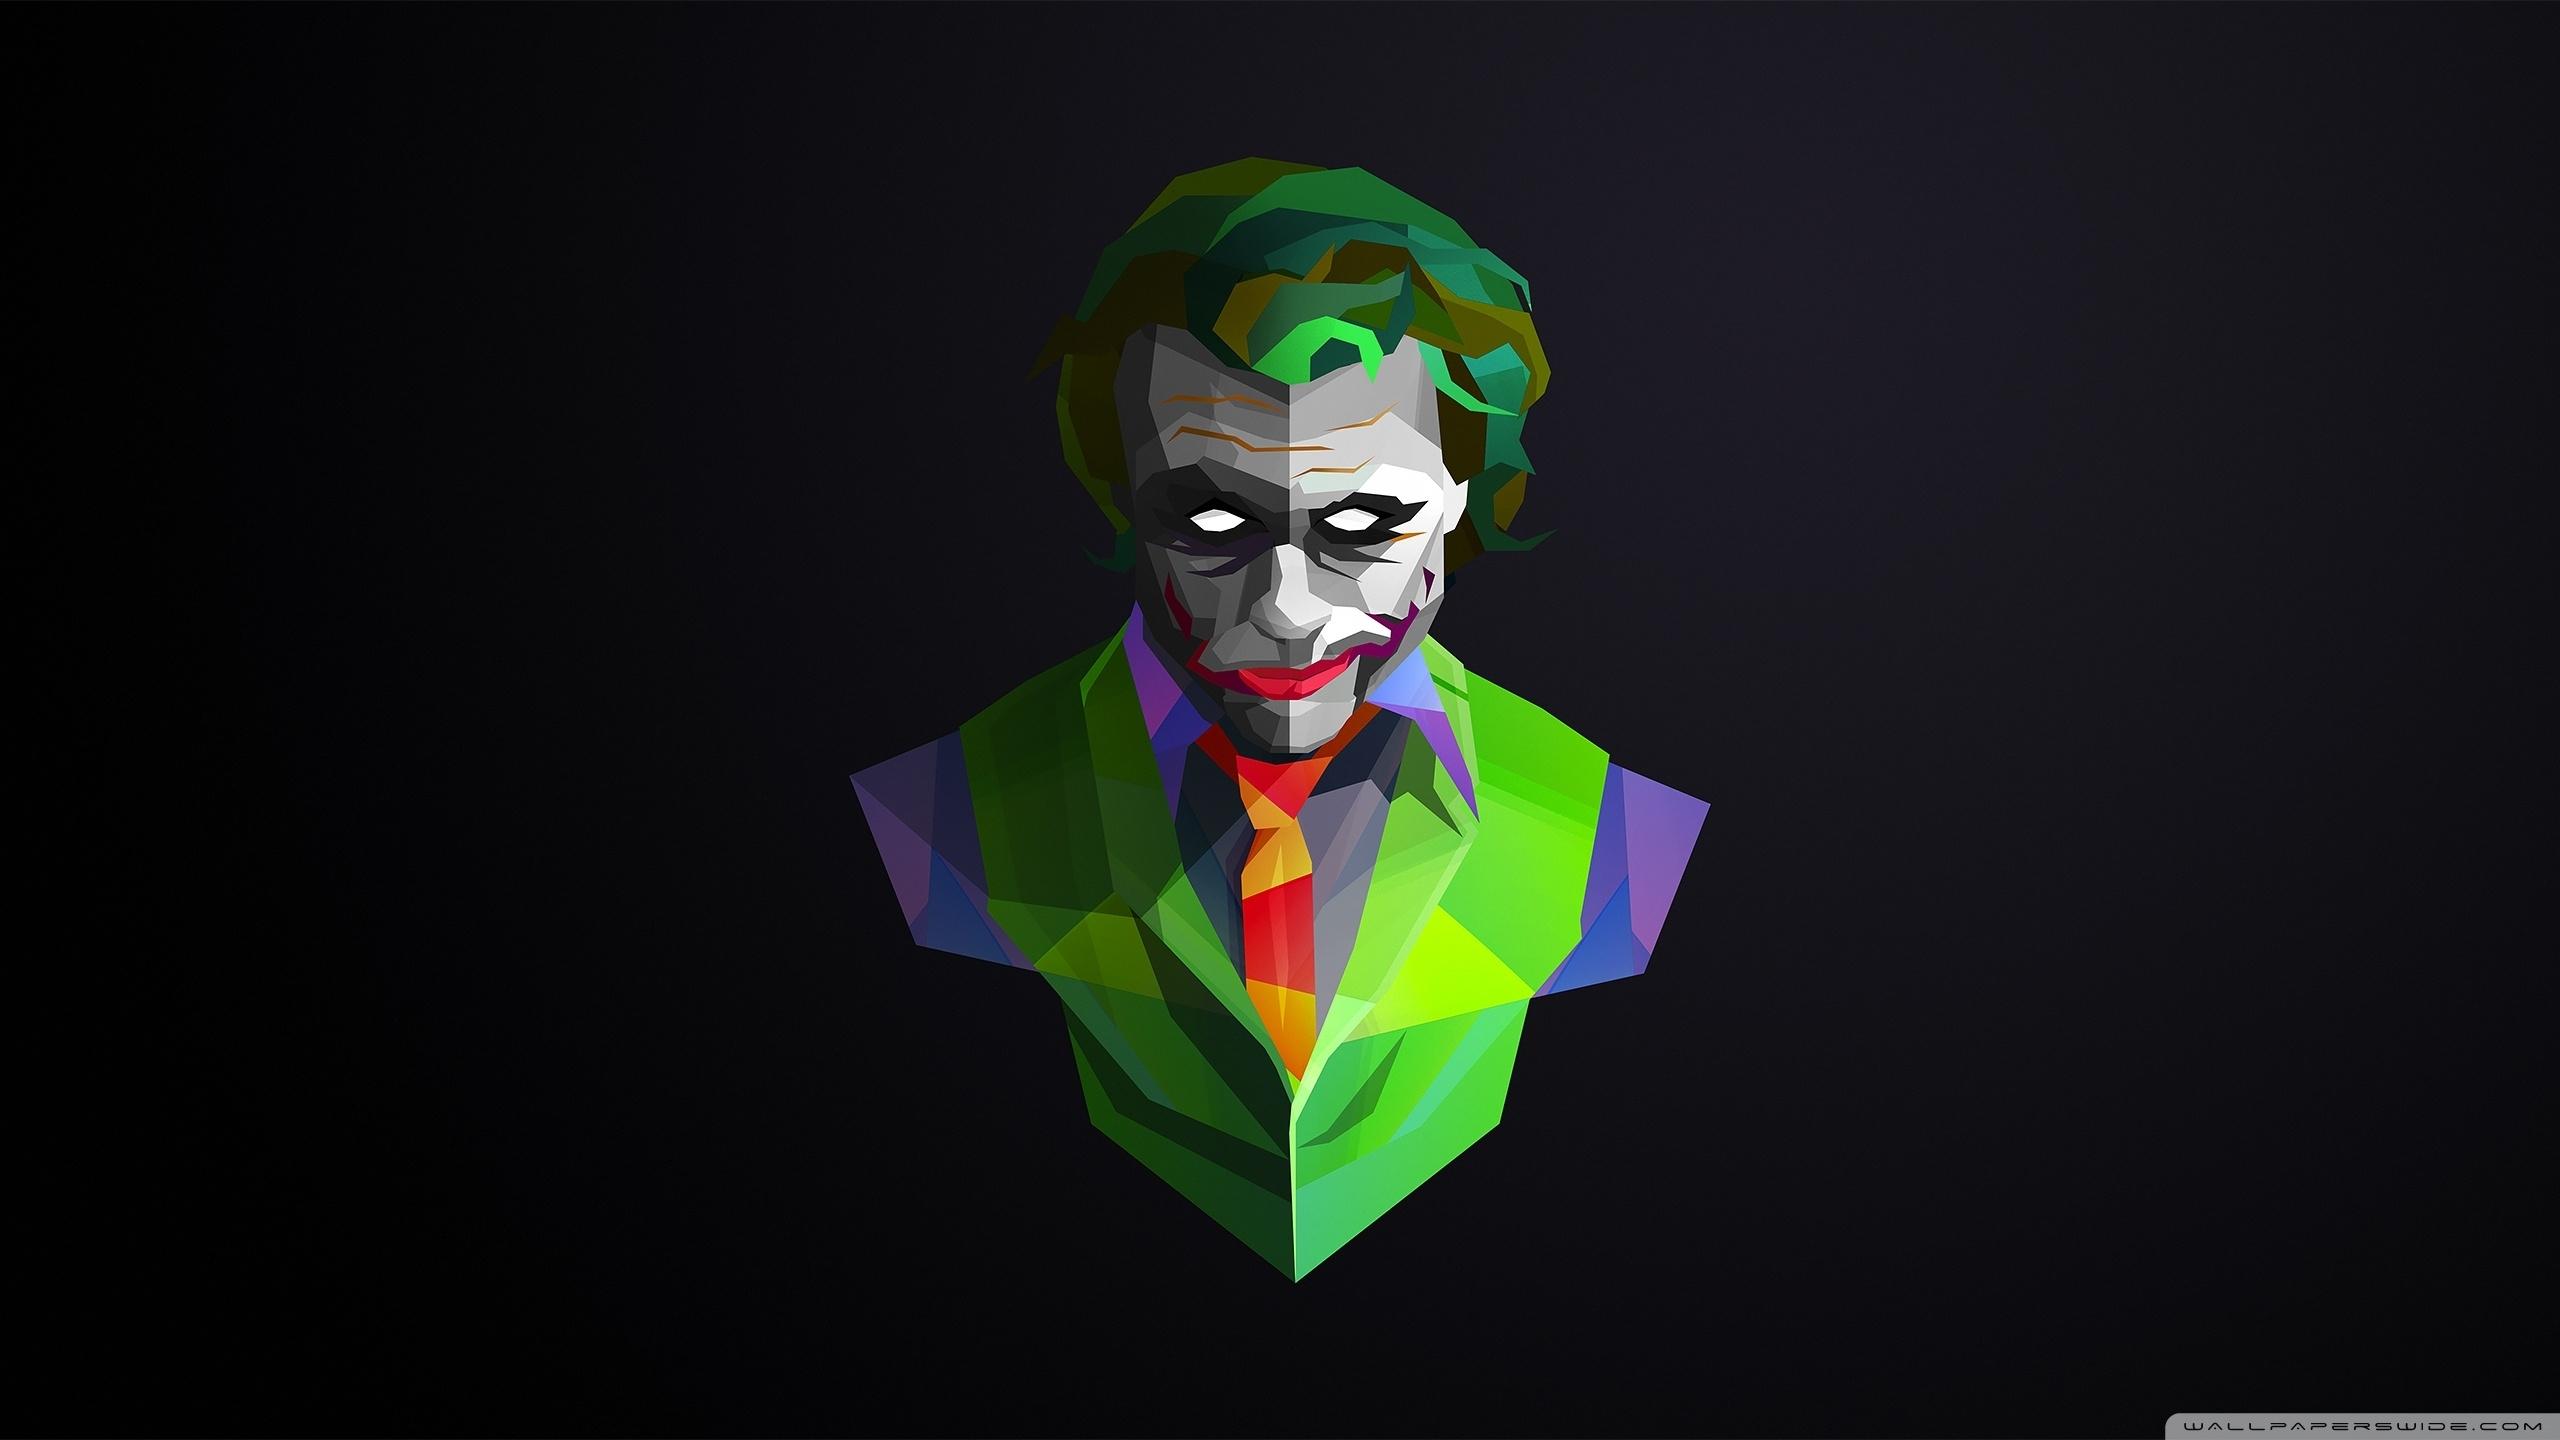 10 Top The Joker Hd Wallpaper Full Hd 1920 1080 For Pc Background